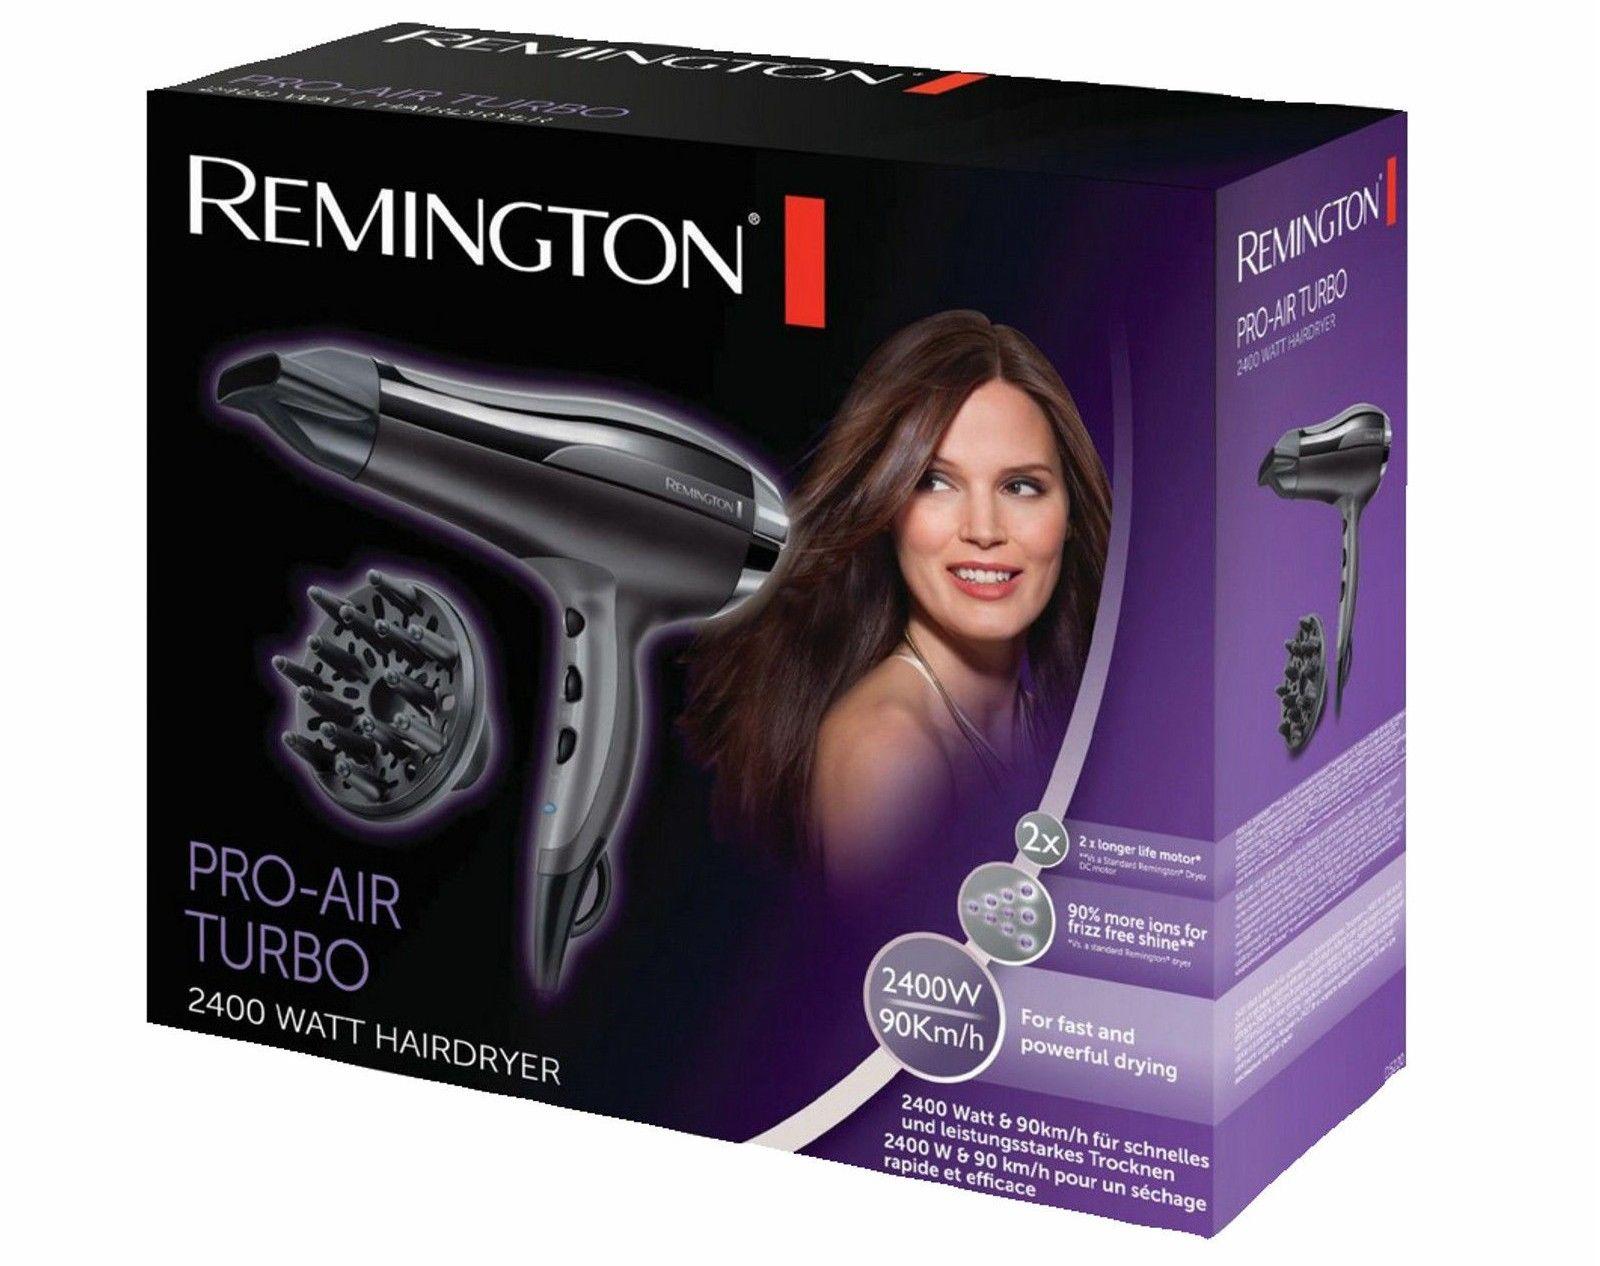 remington air turbo 2400